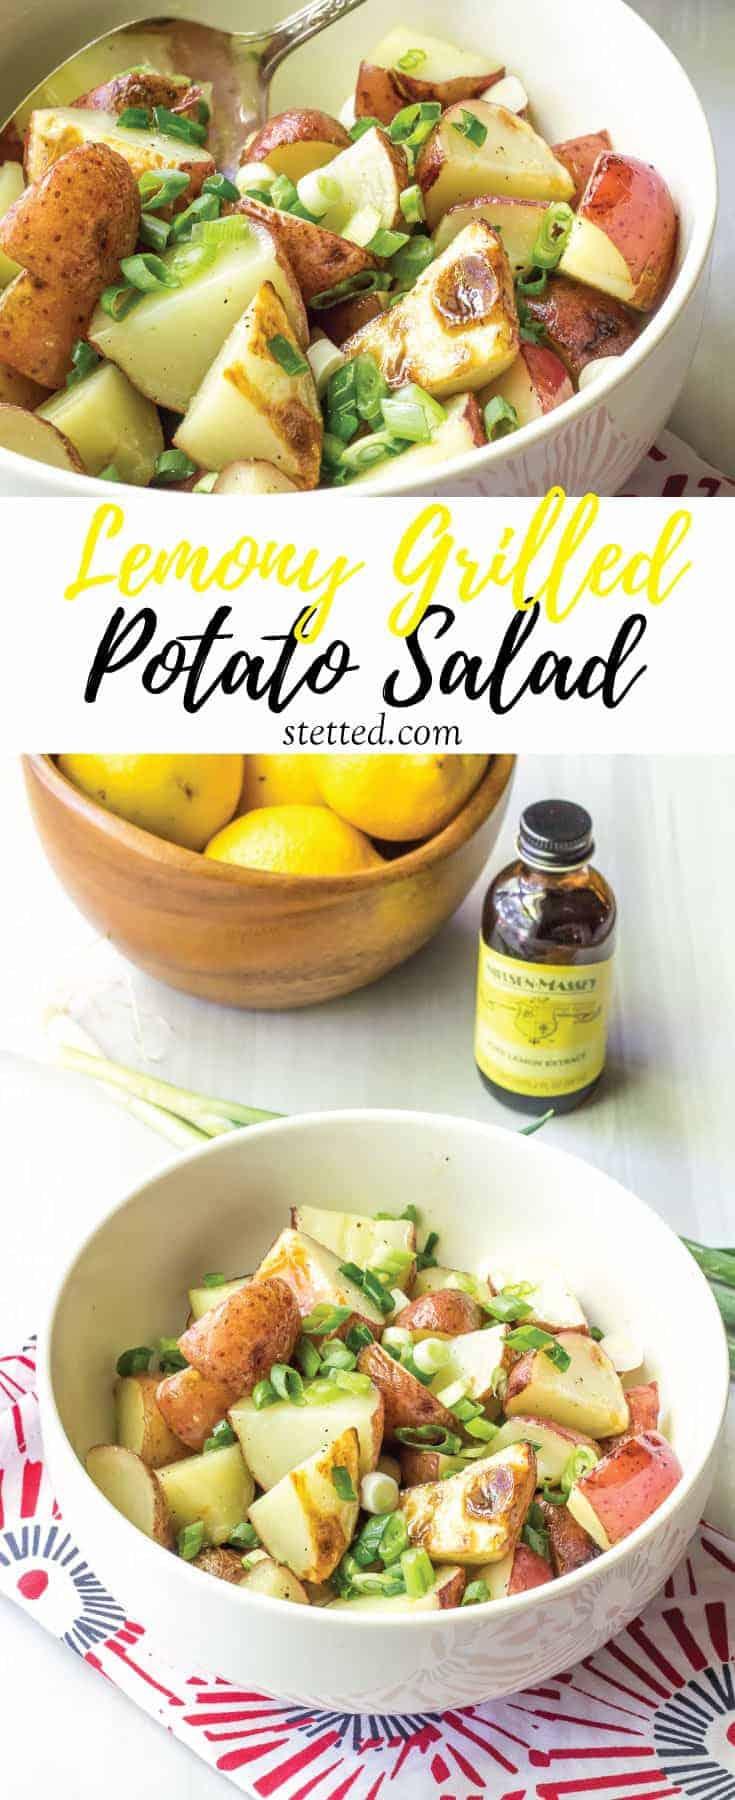 Lemony grilled potato salad is a light, bright twist on summer potato salads.